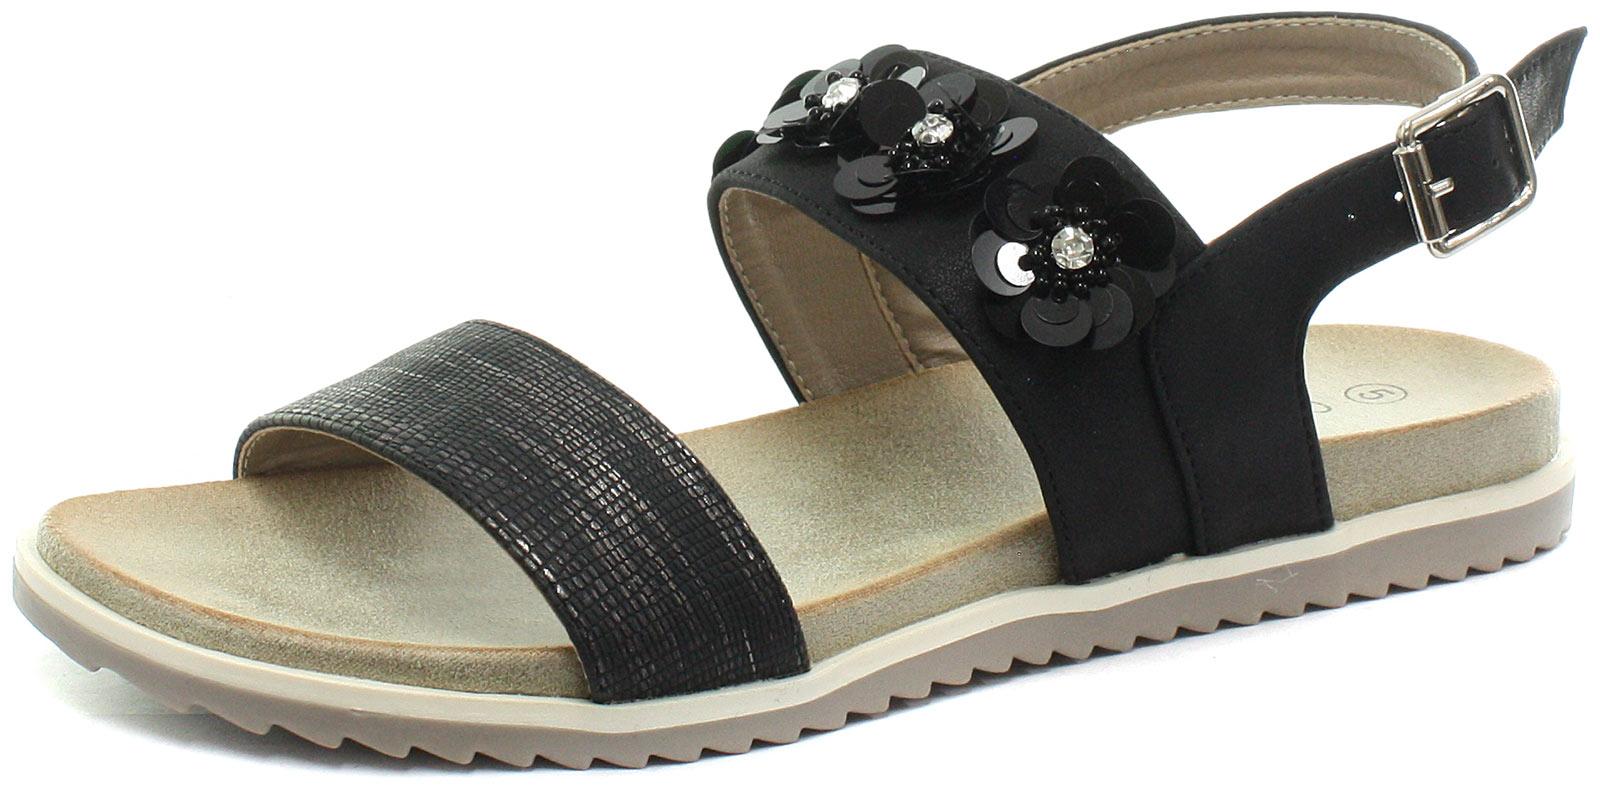 New-Cipriata-Angela-Black-Reptile-Print-Flower-Womens-Sandals-ALL-SIZES